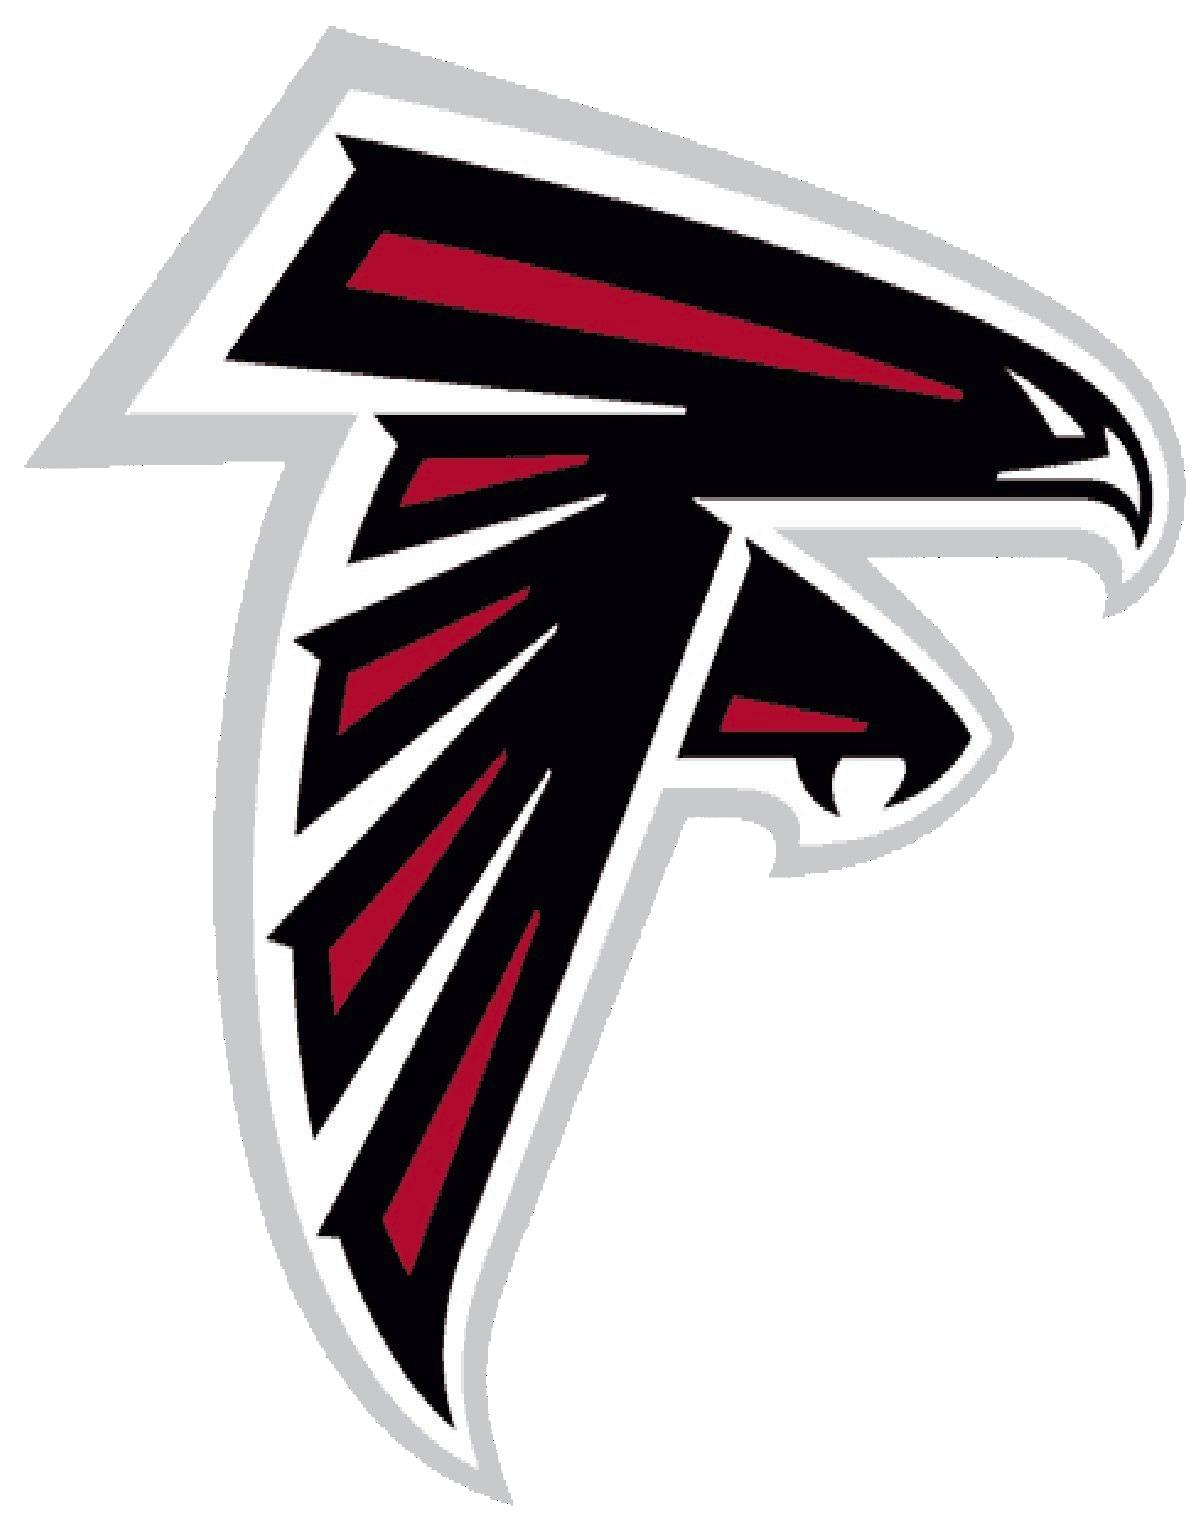 Atlanta falcons football clipart clipart royalty free images of the ATLANTA FALCONS football logos | Atlanta Falcons ... clipart royalty free